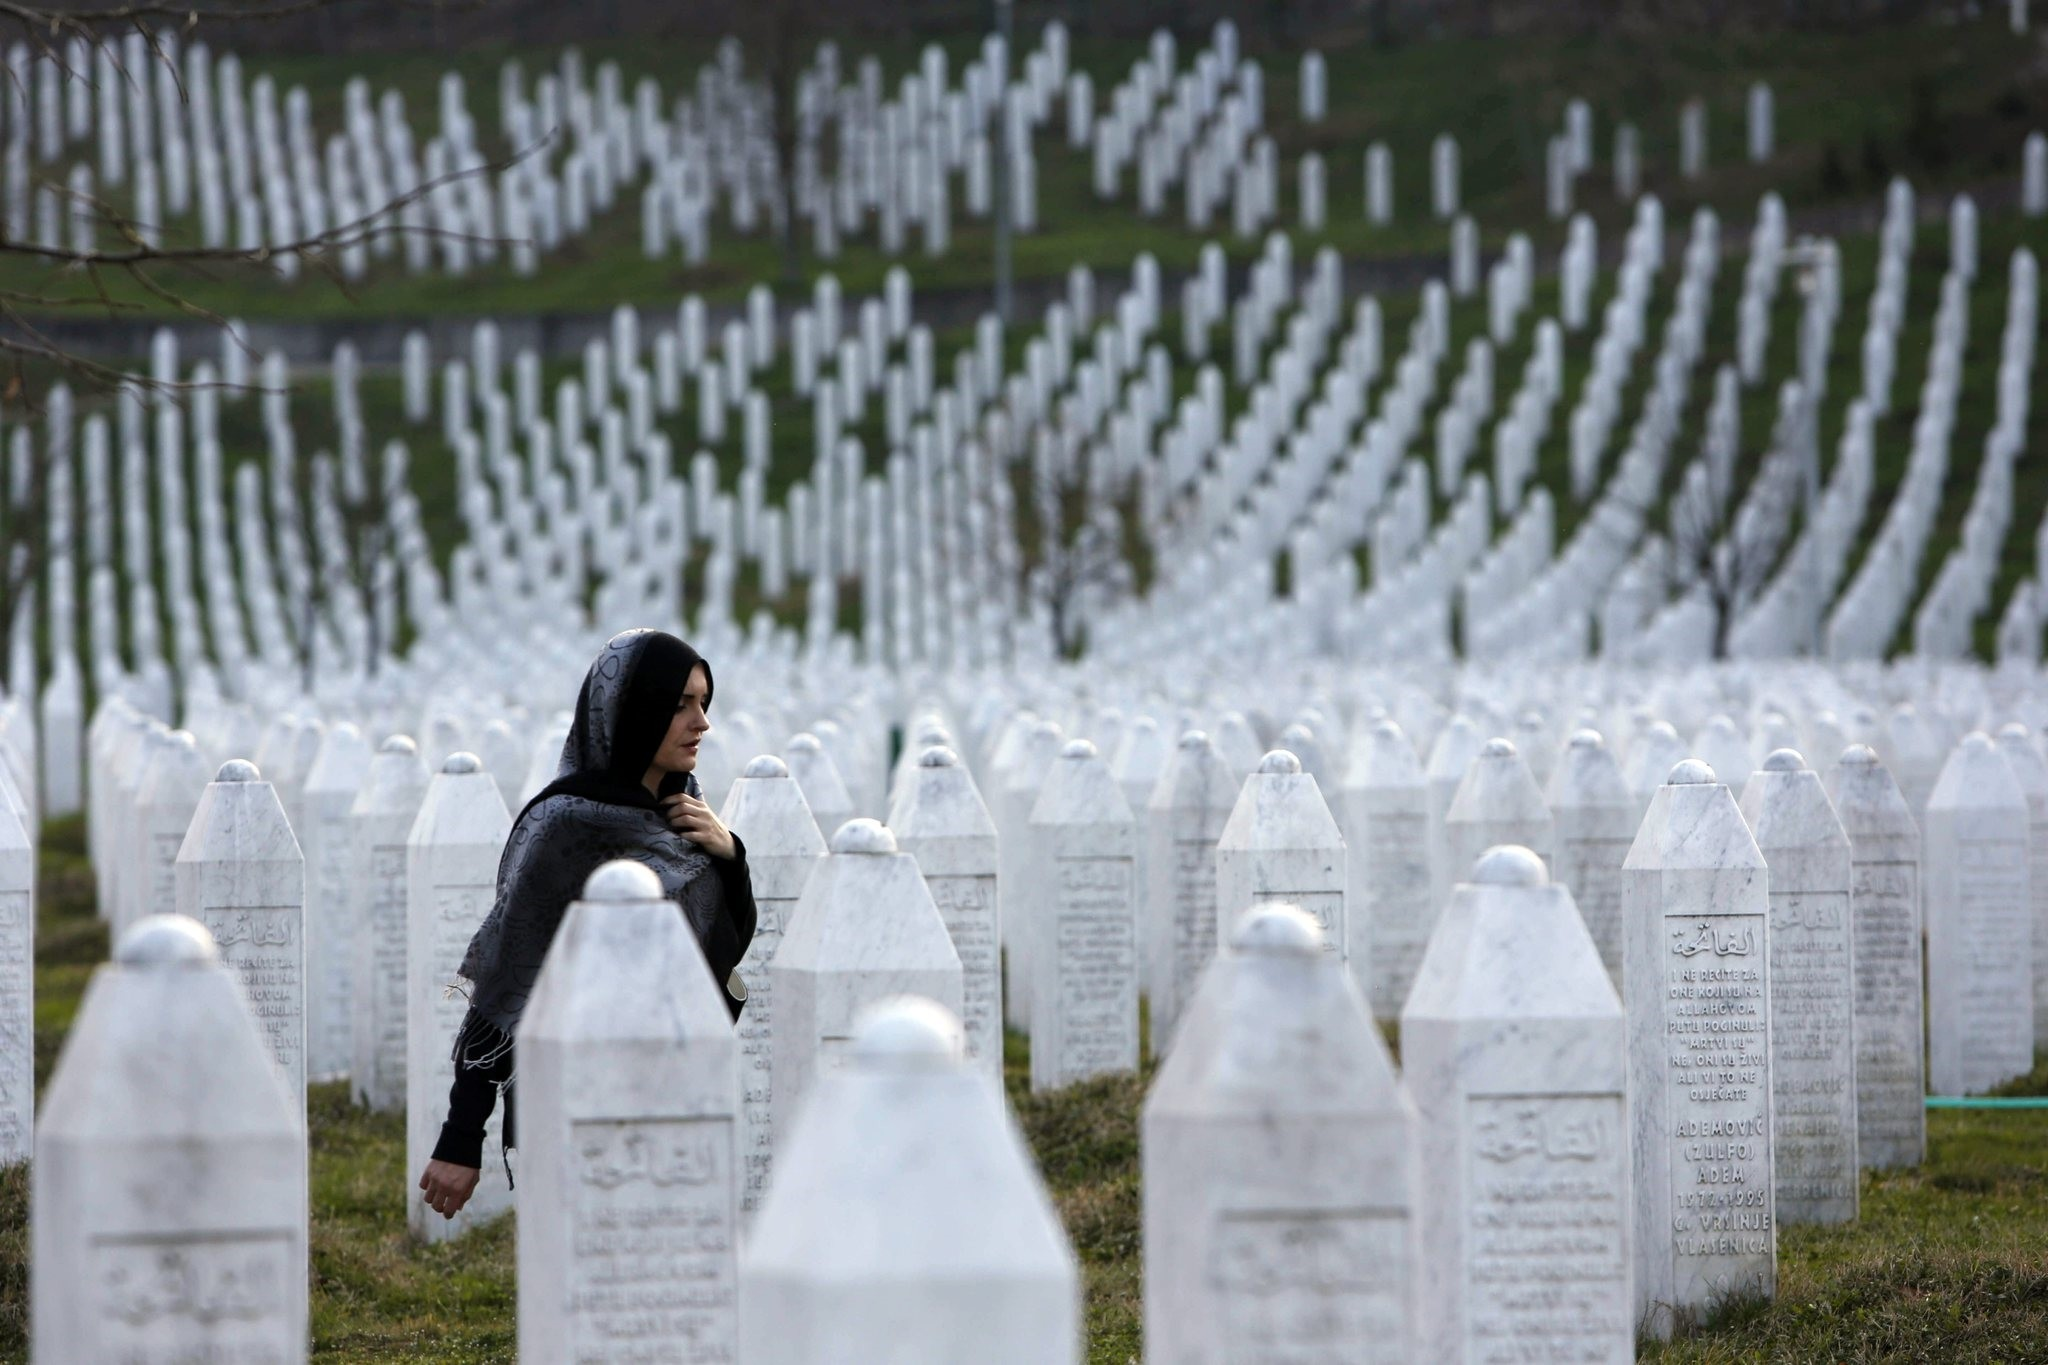 Bosnian woman walks among gravestones at Memorial Centre Potocari near Srebrenica, Bosnia and Herzegovina. (AP Photo)